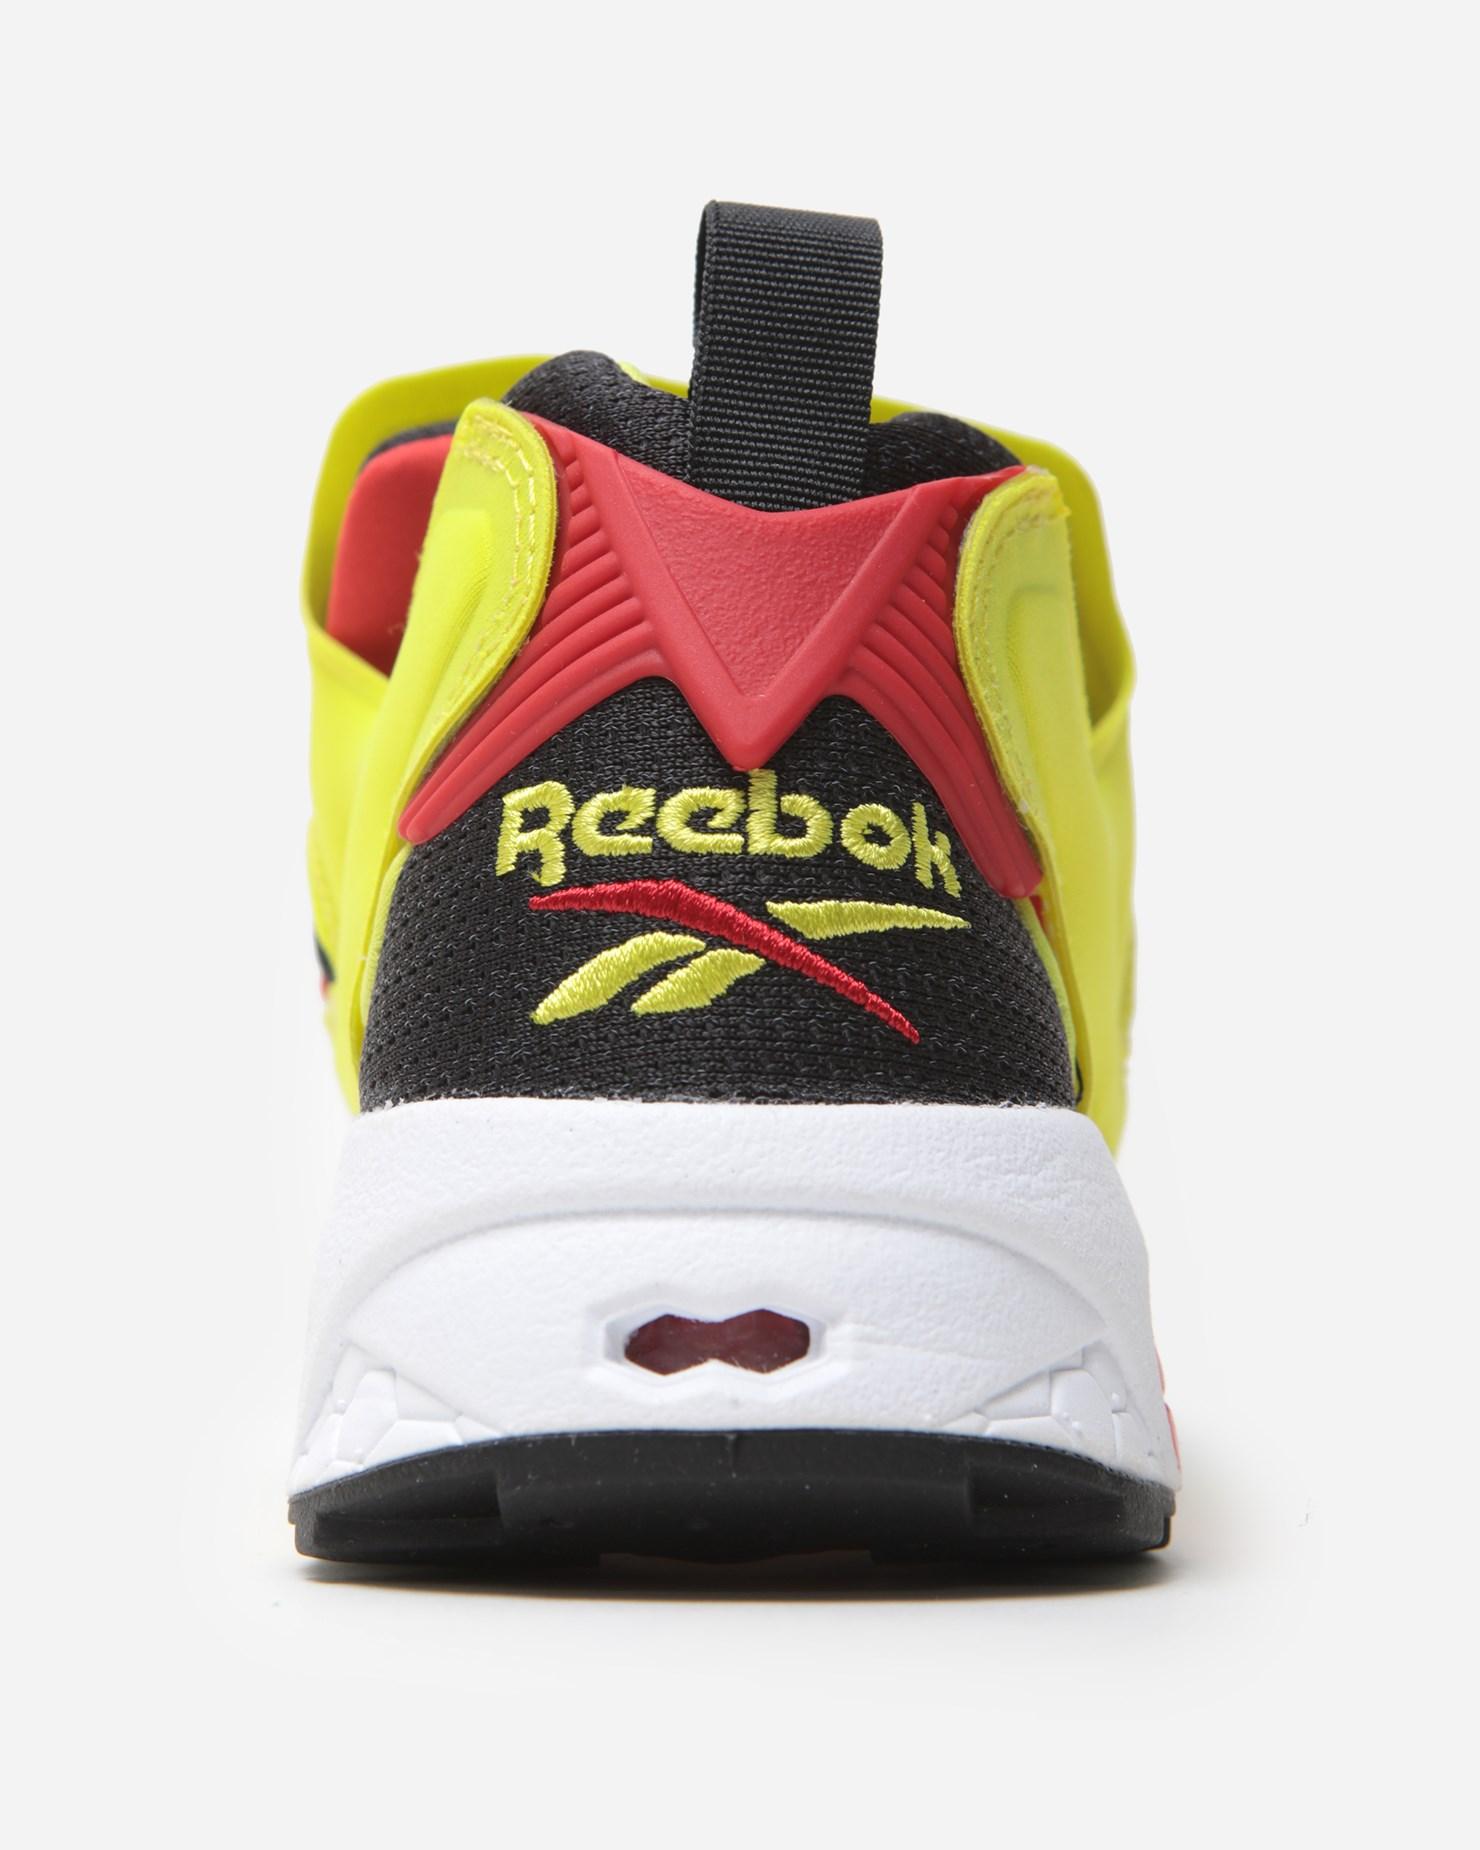 Reebok CLASSIC INSTAPUMP FURY OG CITRON at mita sneakers